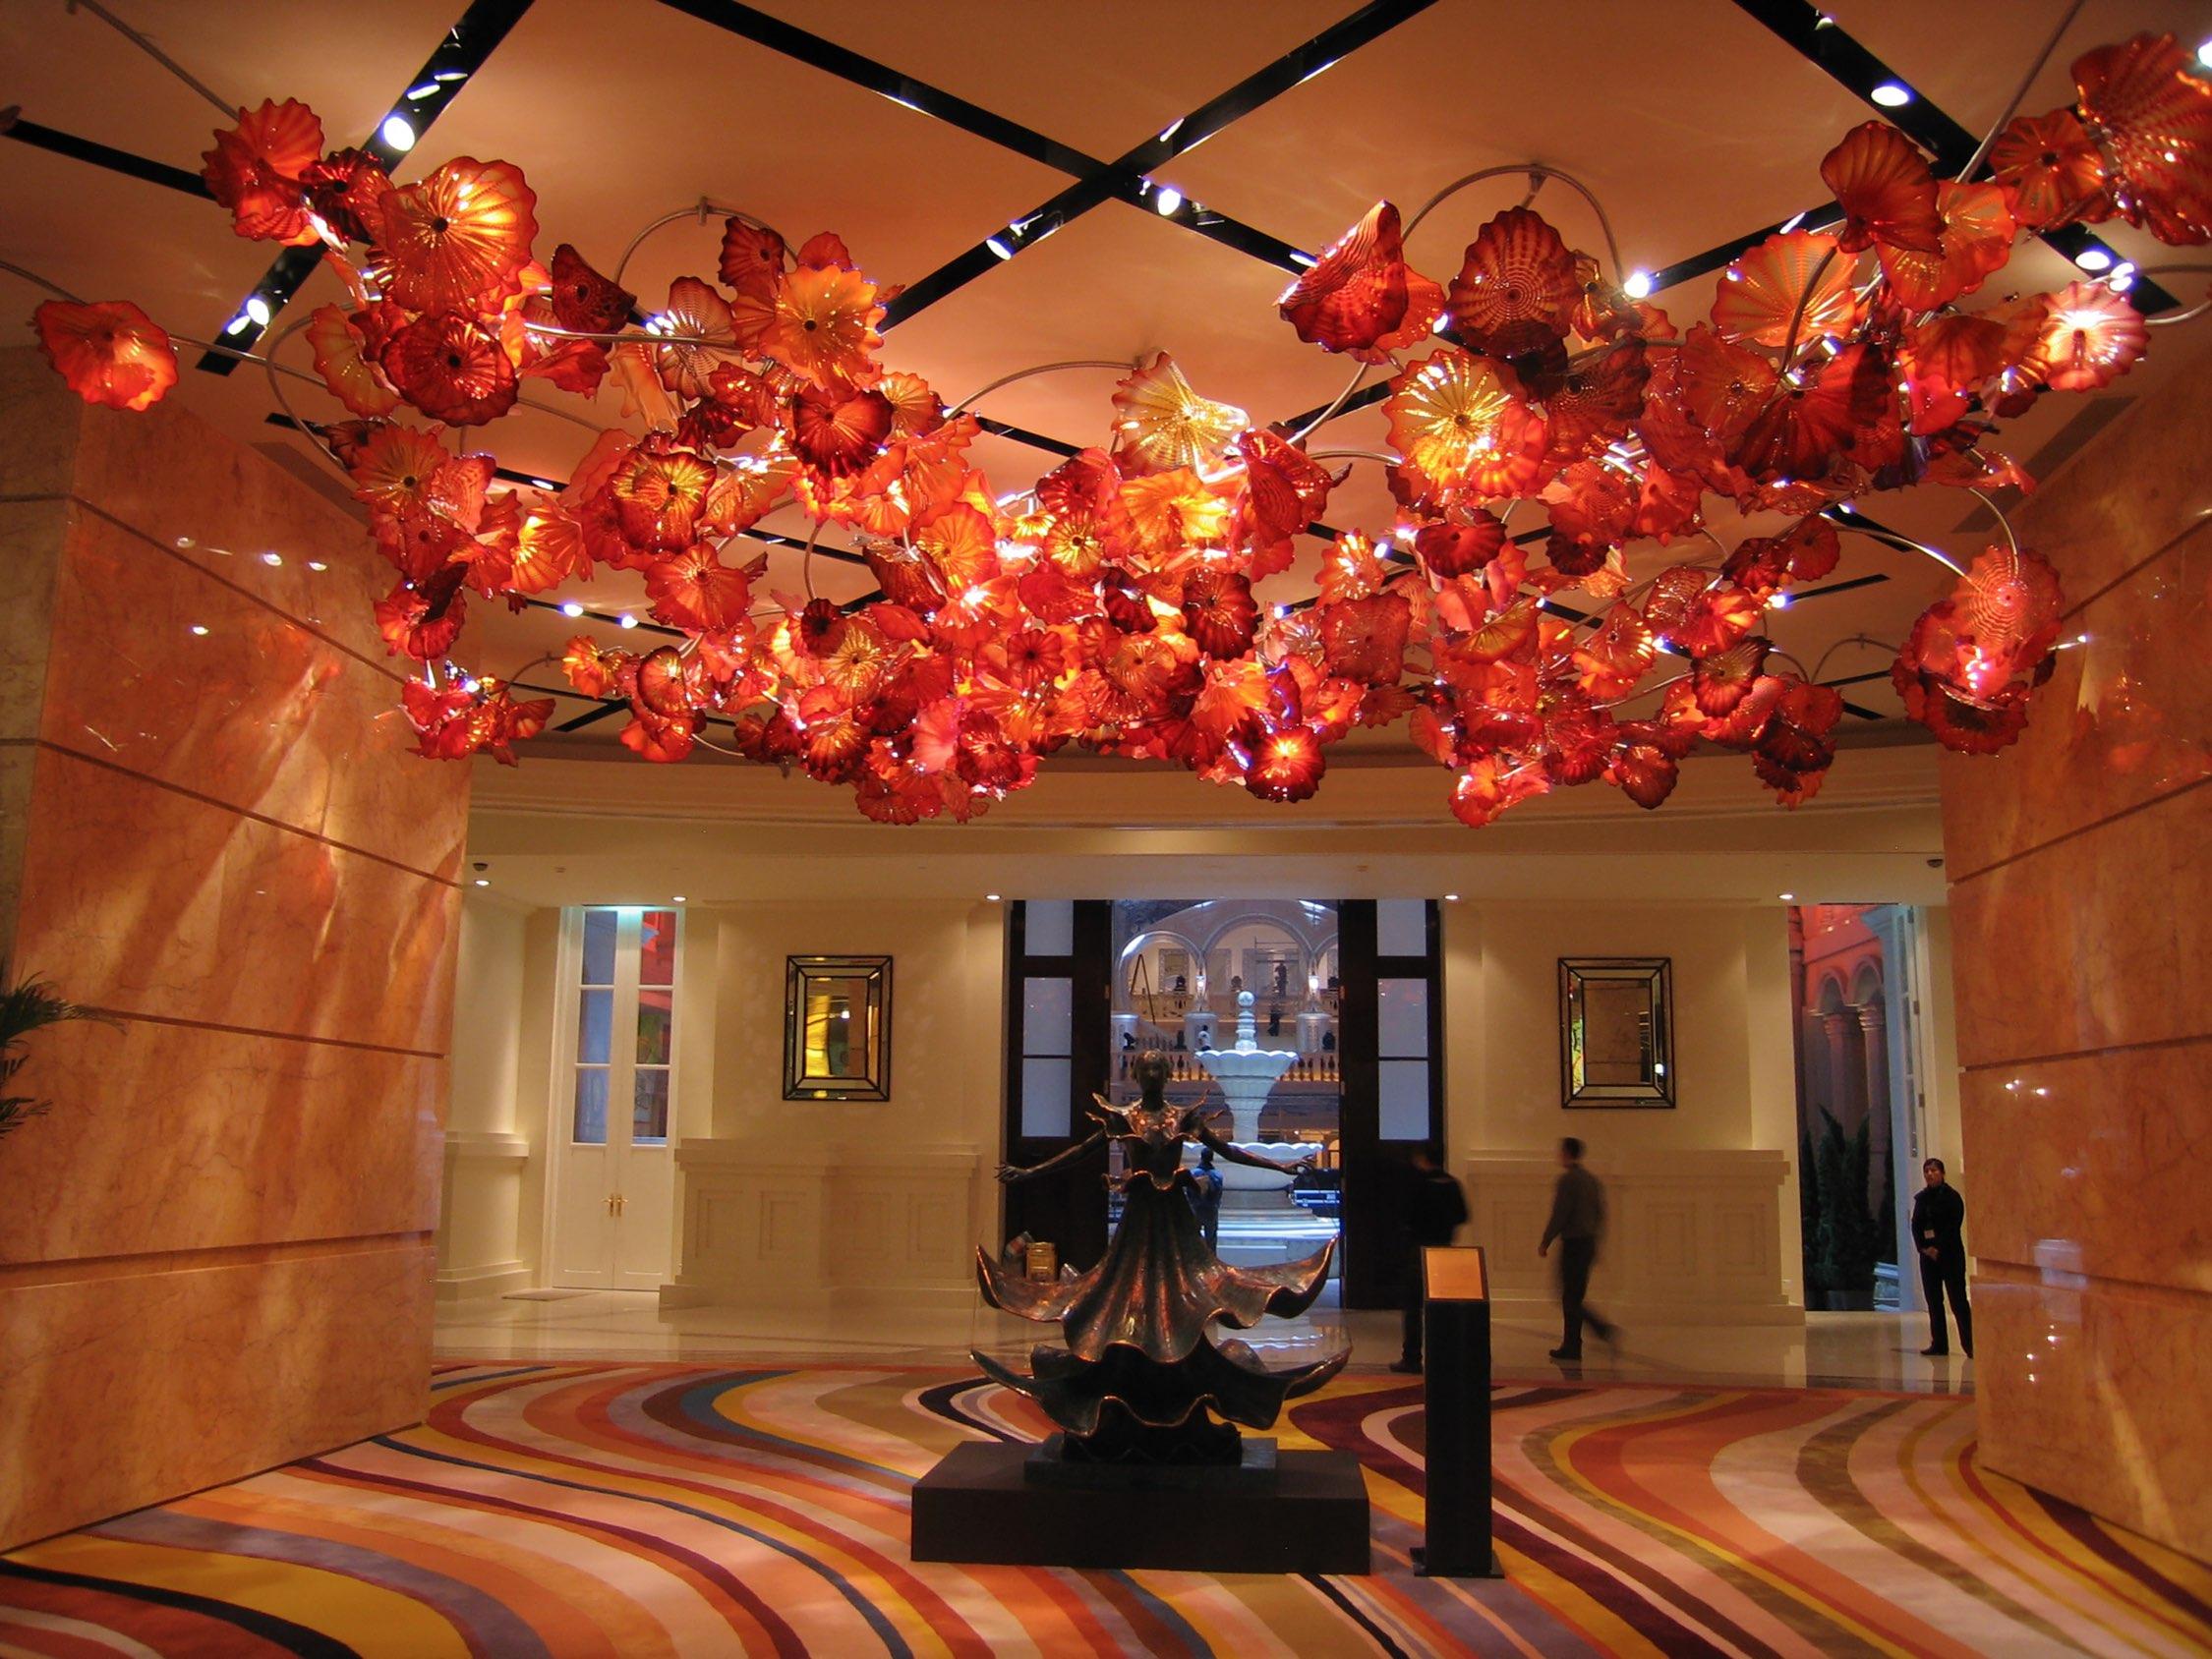 MGM-Grand-Studio-Lux-Macau-1